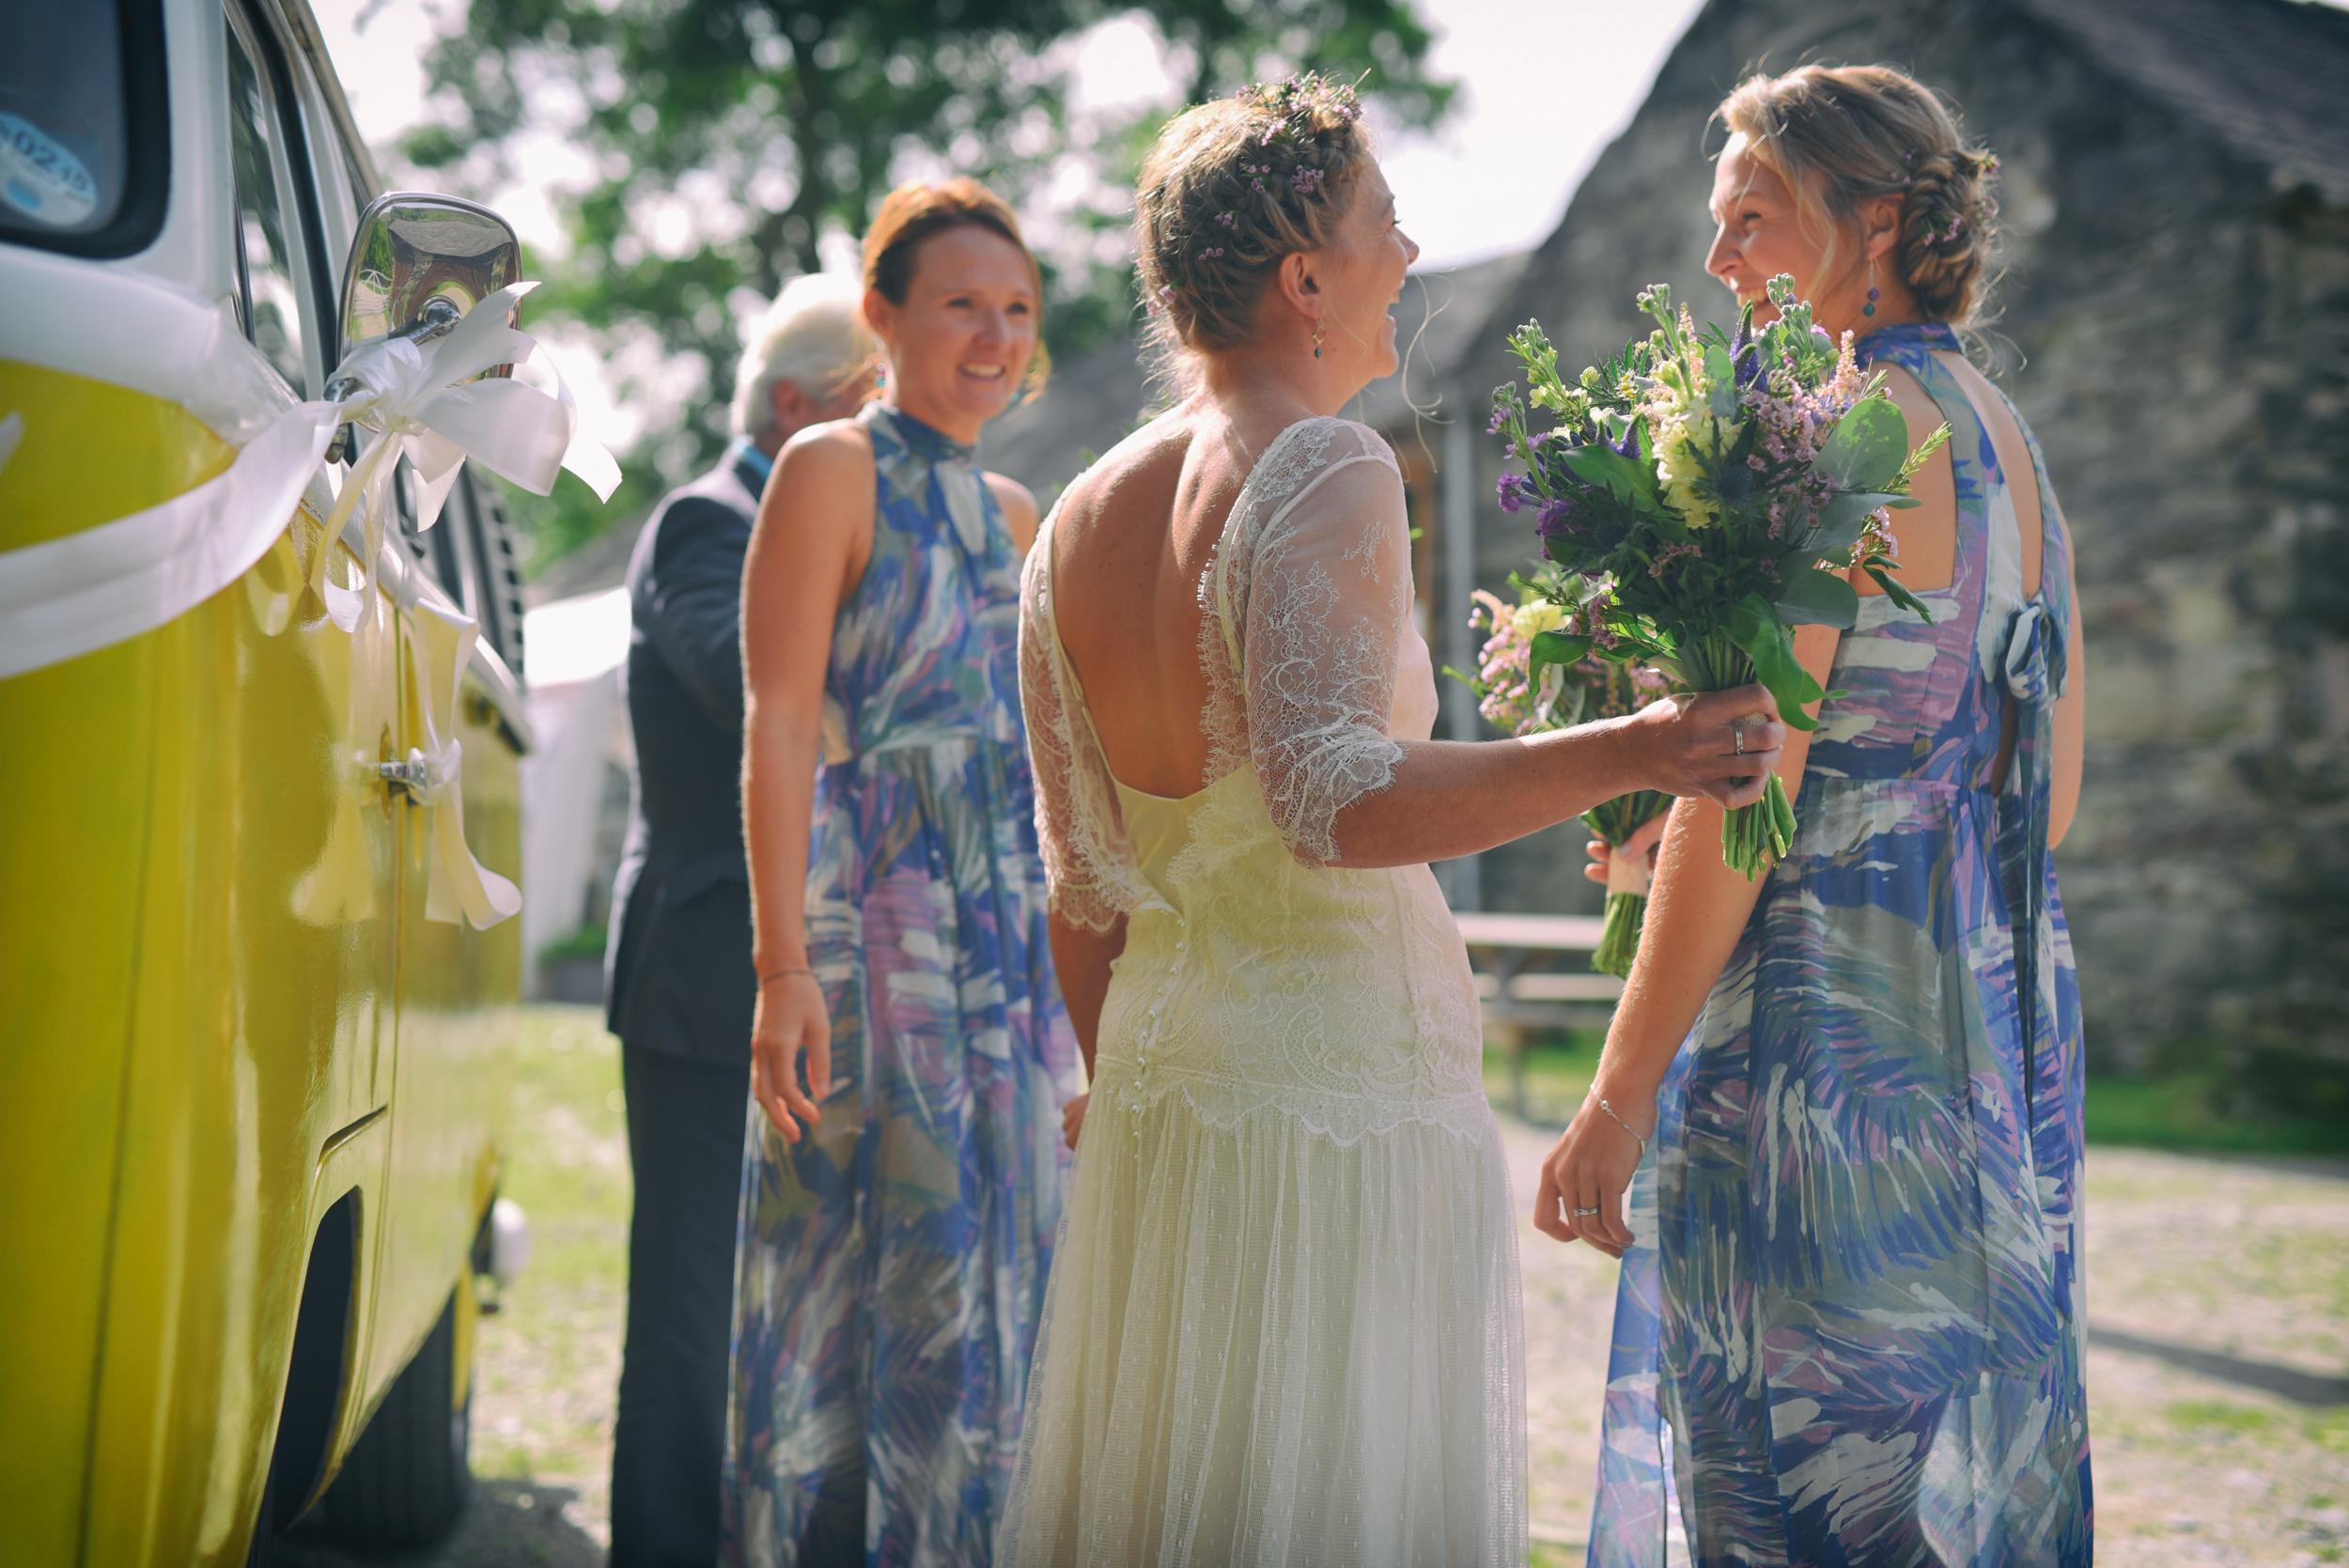 Miriam-Bespoke-Lace-Wedding-Dress-Kate-Beaumont-Sheffield-1.jpg